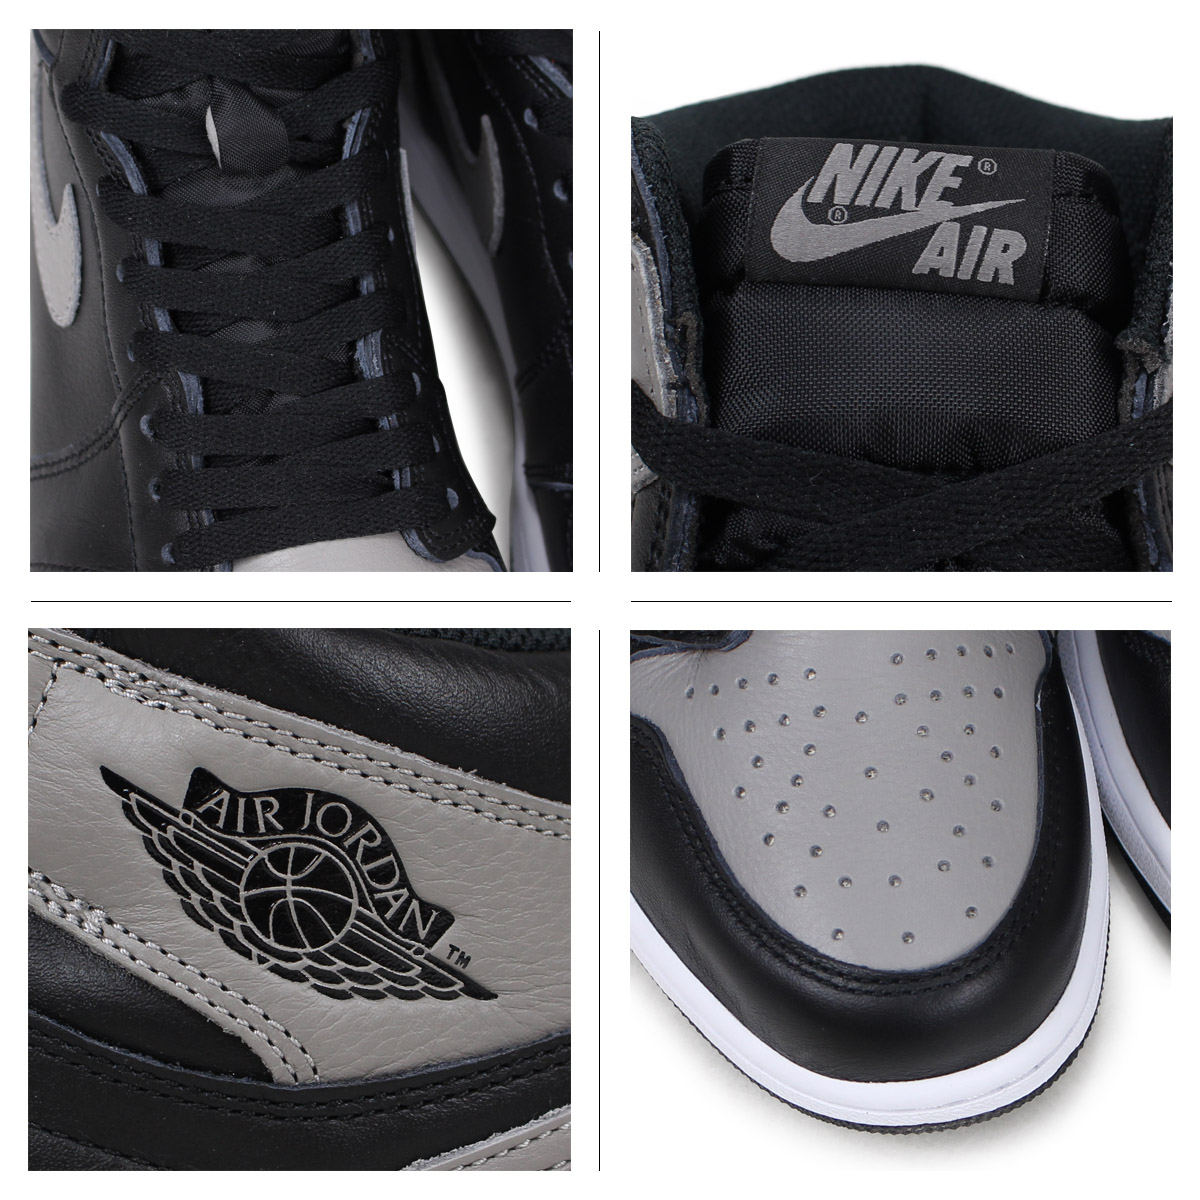 NIKE AIR JORDAN 1 RETRO HIGH OG SHADOW Nike Air Jordan 1 nostalgic high sneakers men 555,088 013 gray [load planned Shinnyu load in reservation